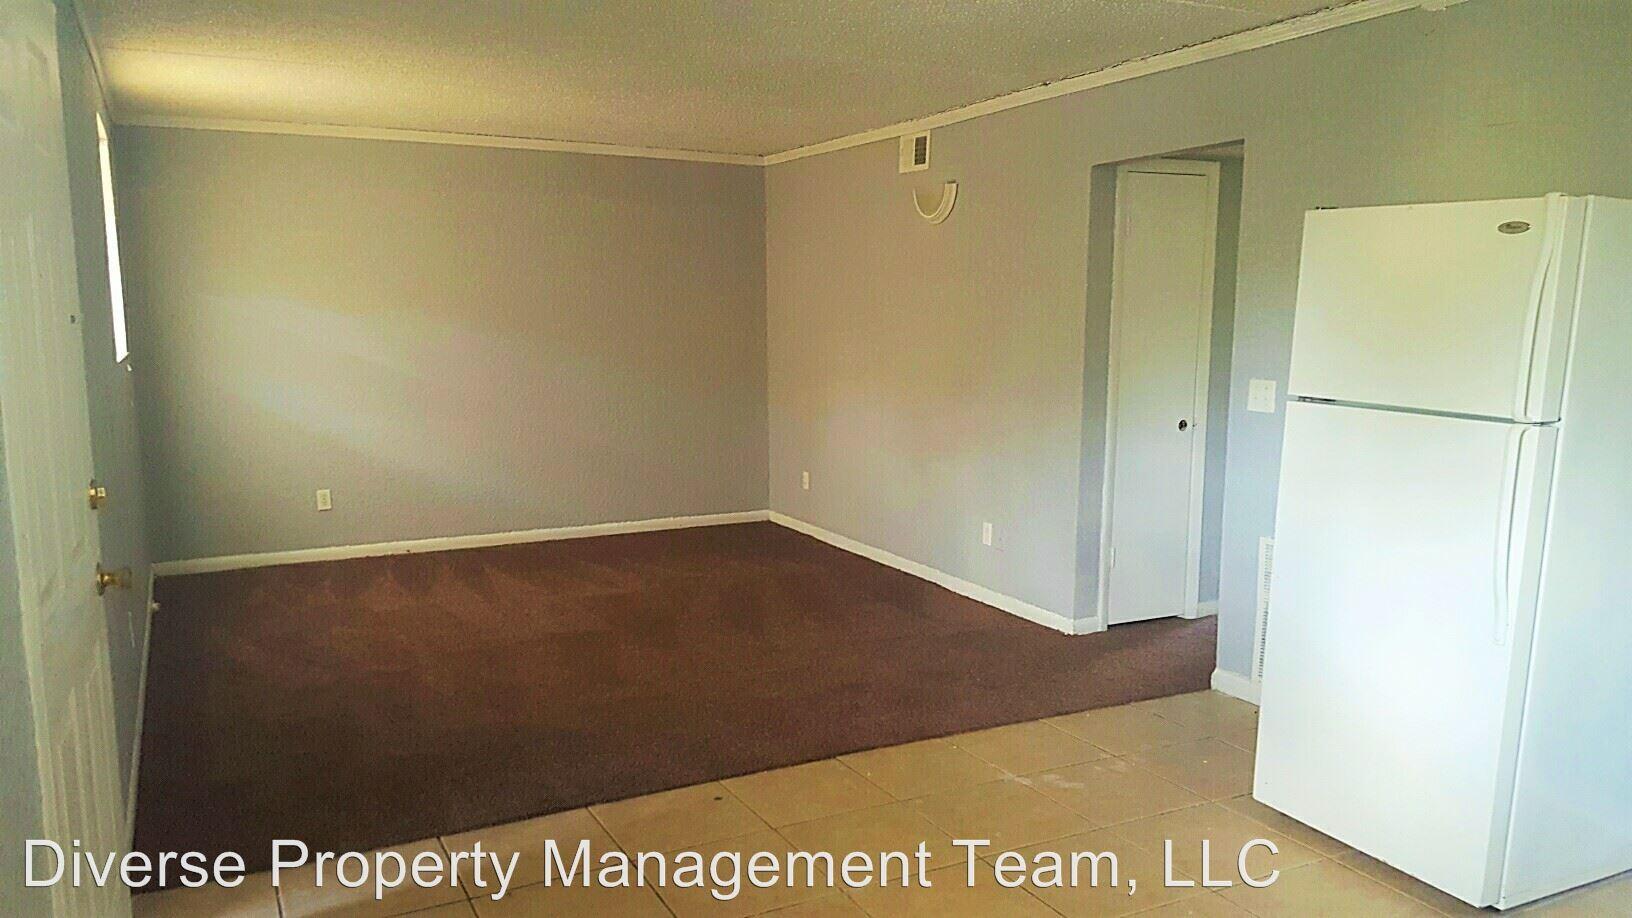 Brickstone Property Management Jacksonville